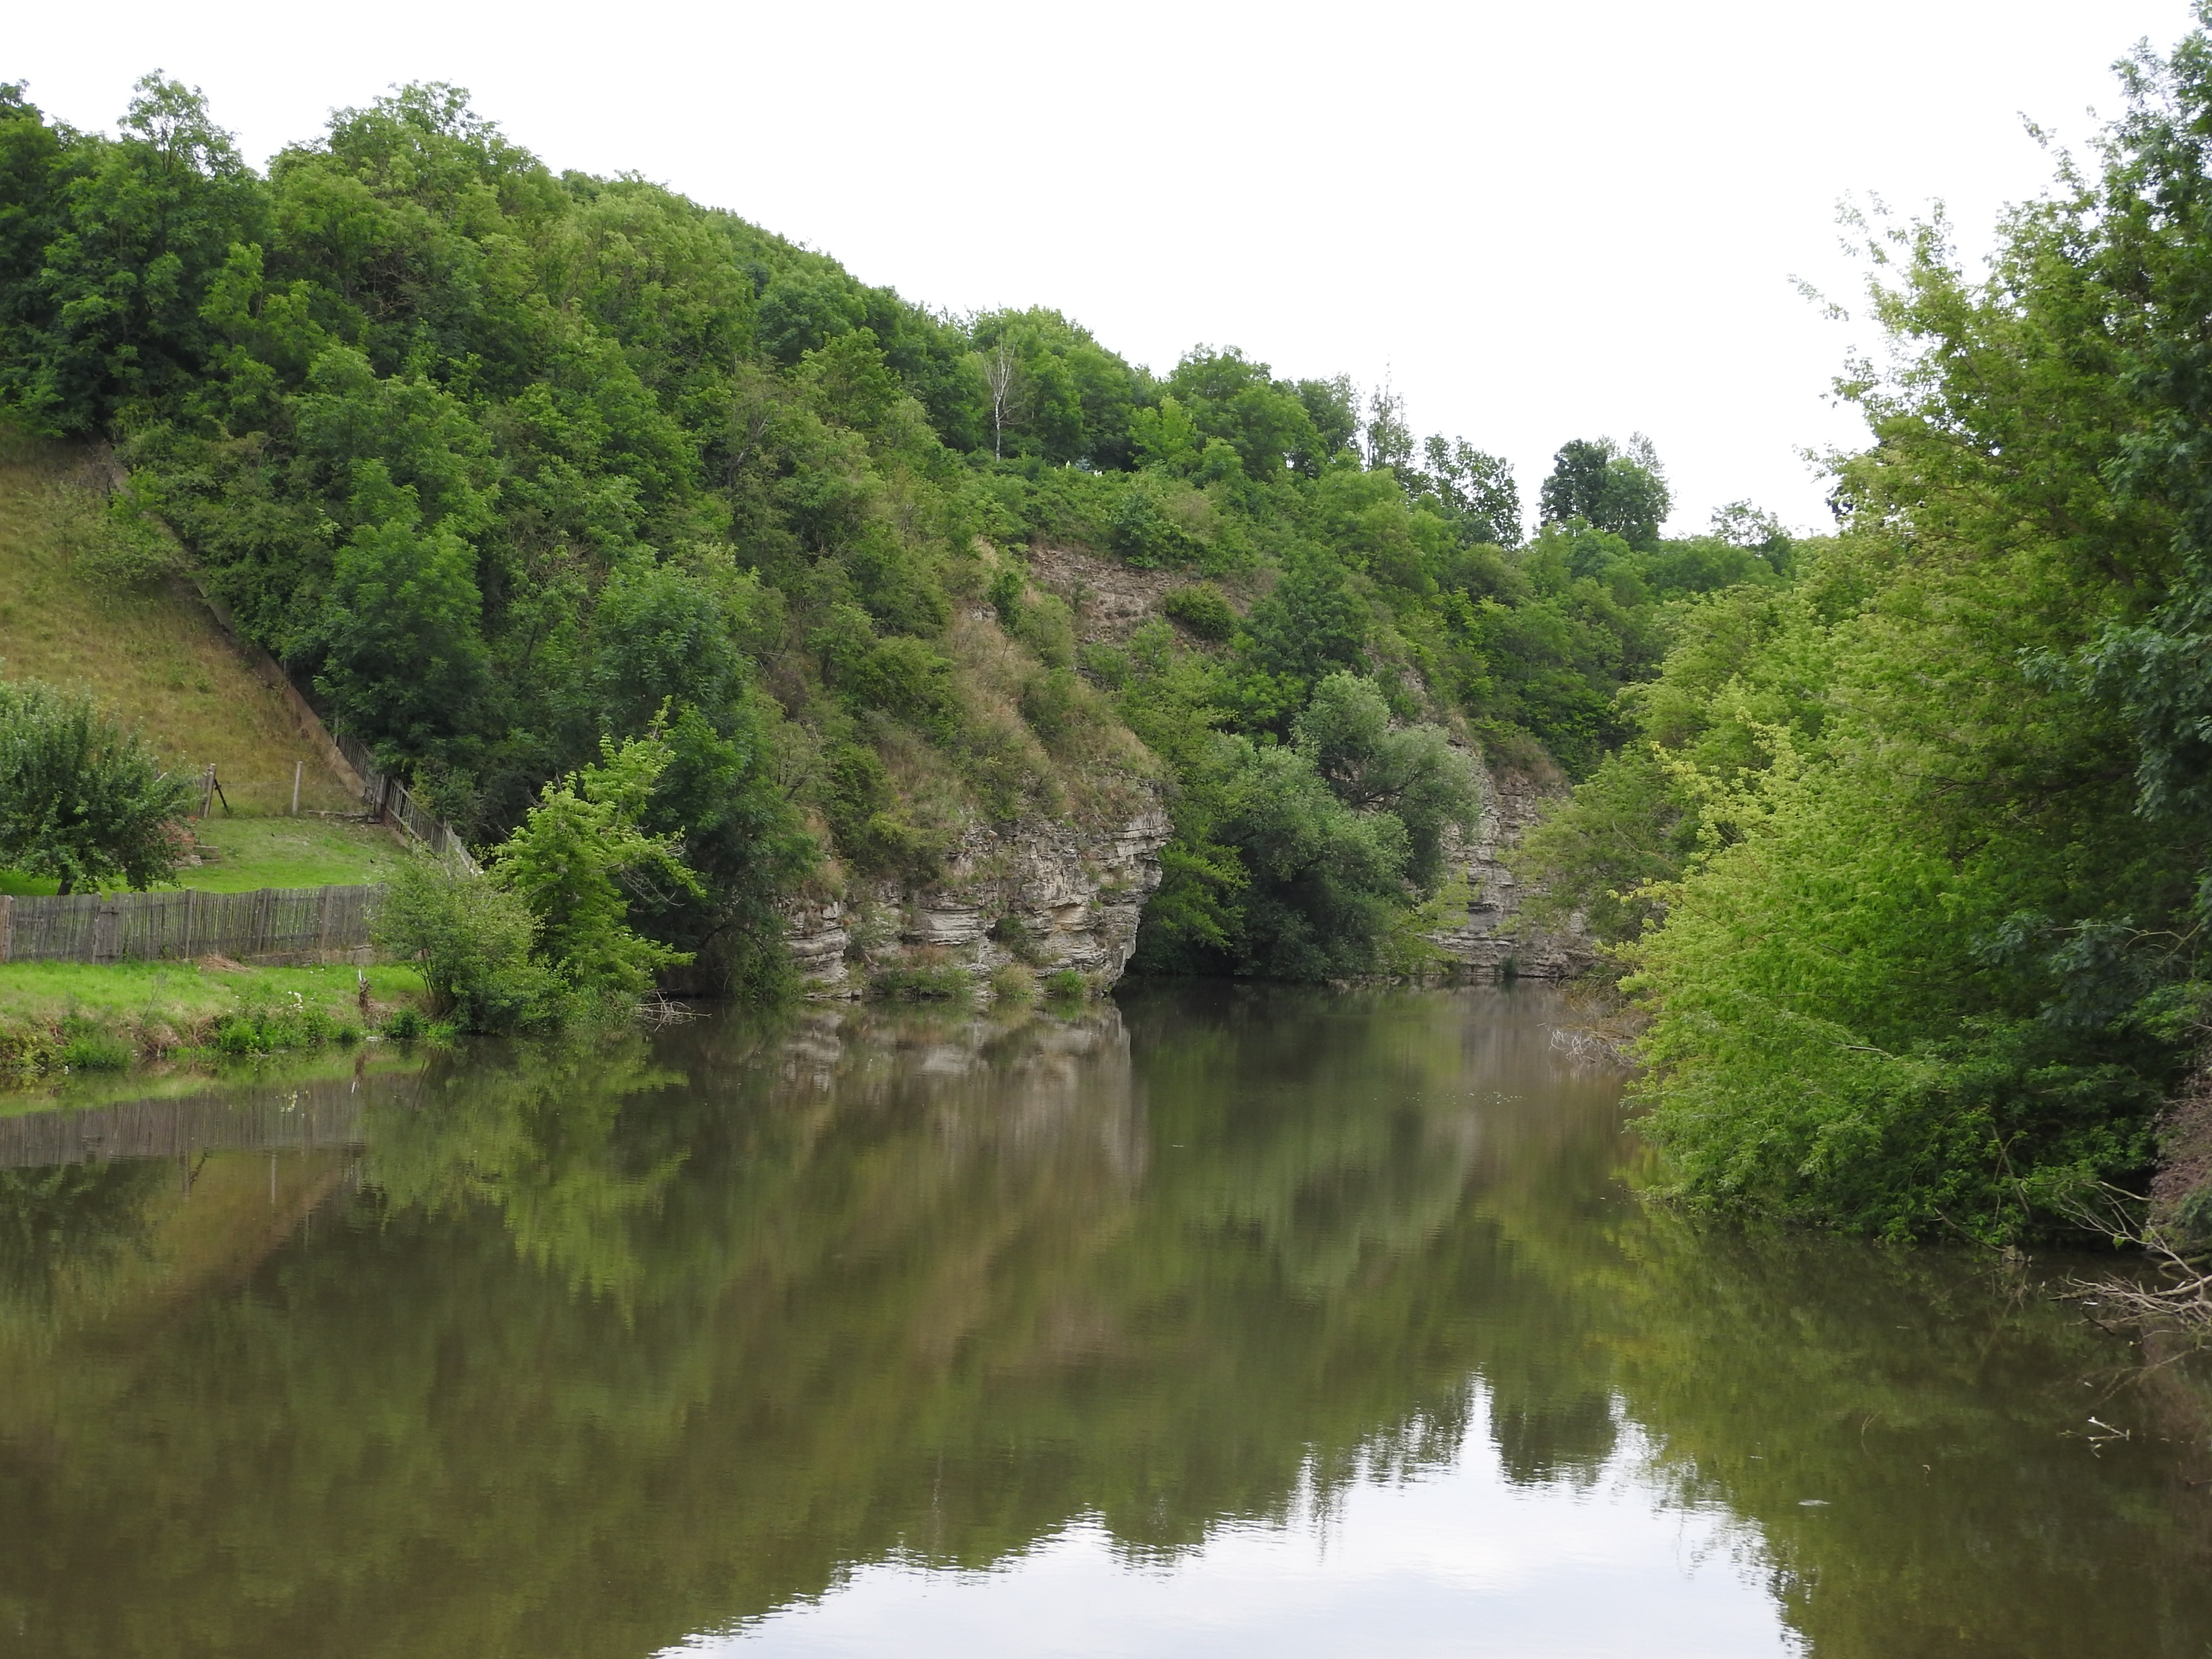 Saale-Holzland-Kreis District, Thuringia, Germany